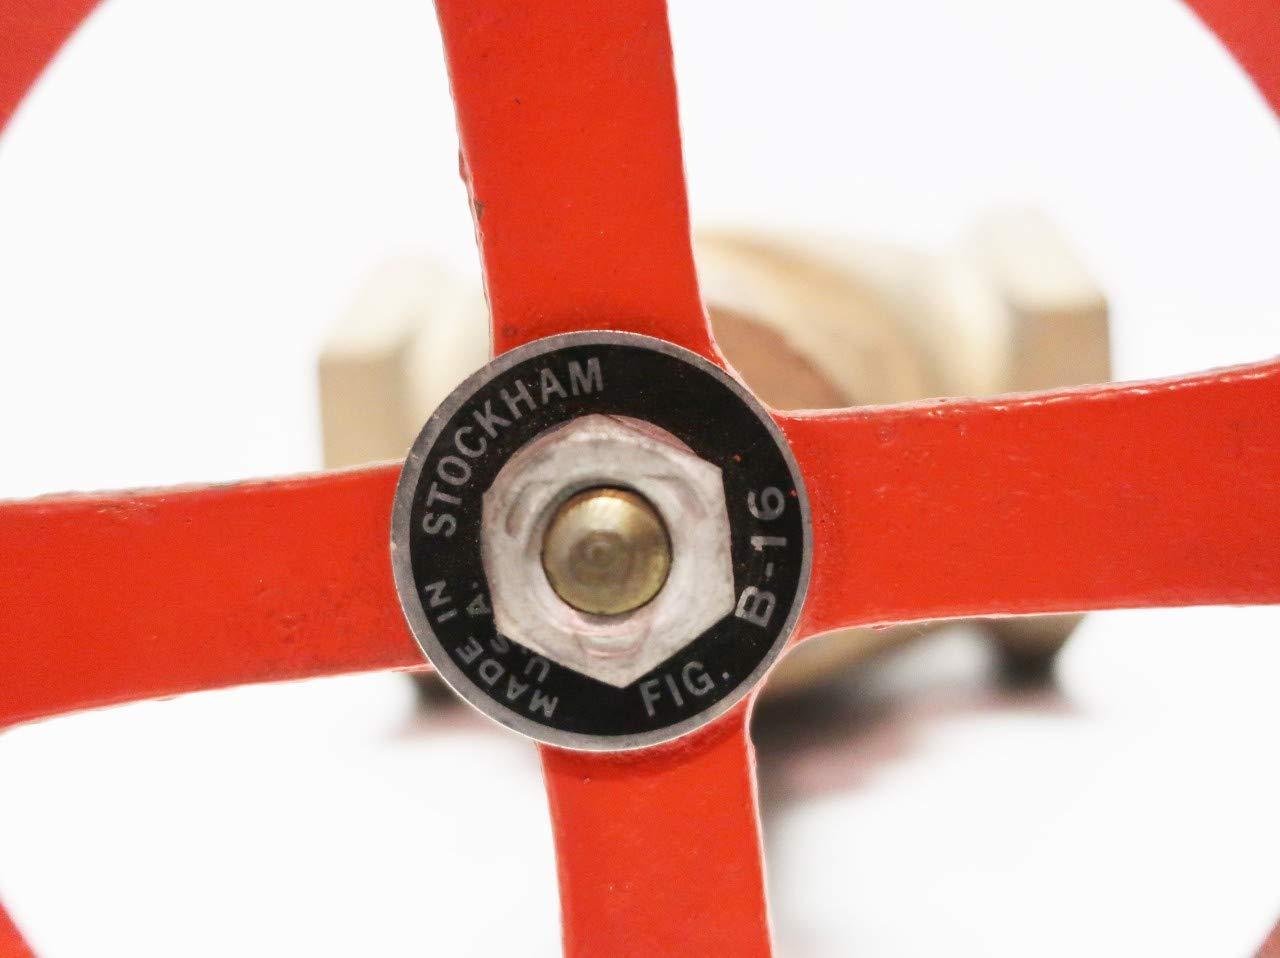 STOCKHAM B-16 Manual Bronze Threaded 3IN NPT Globe Valve